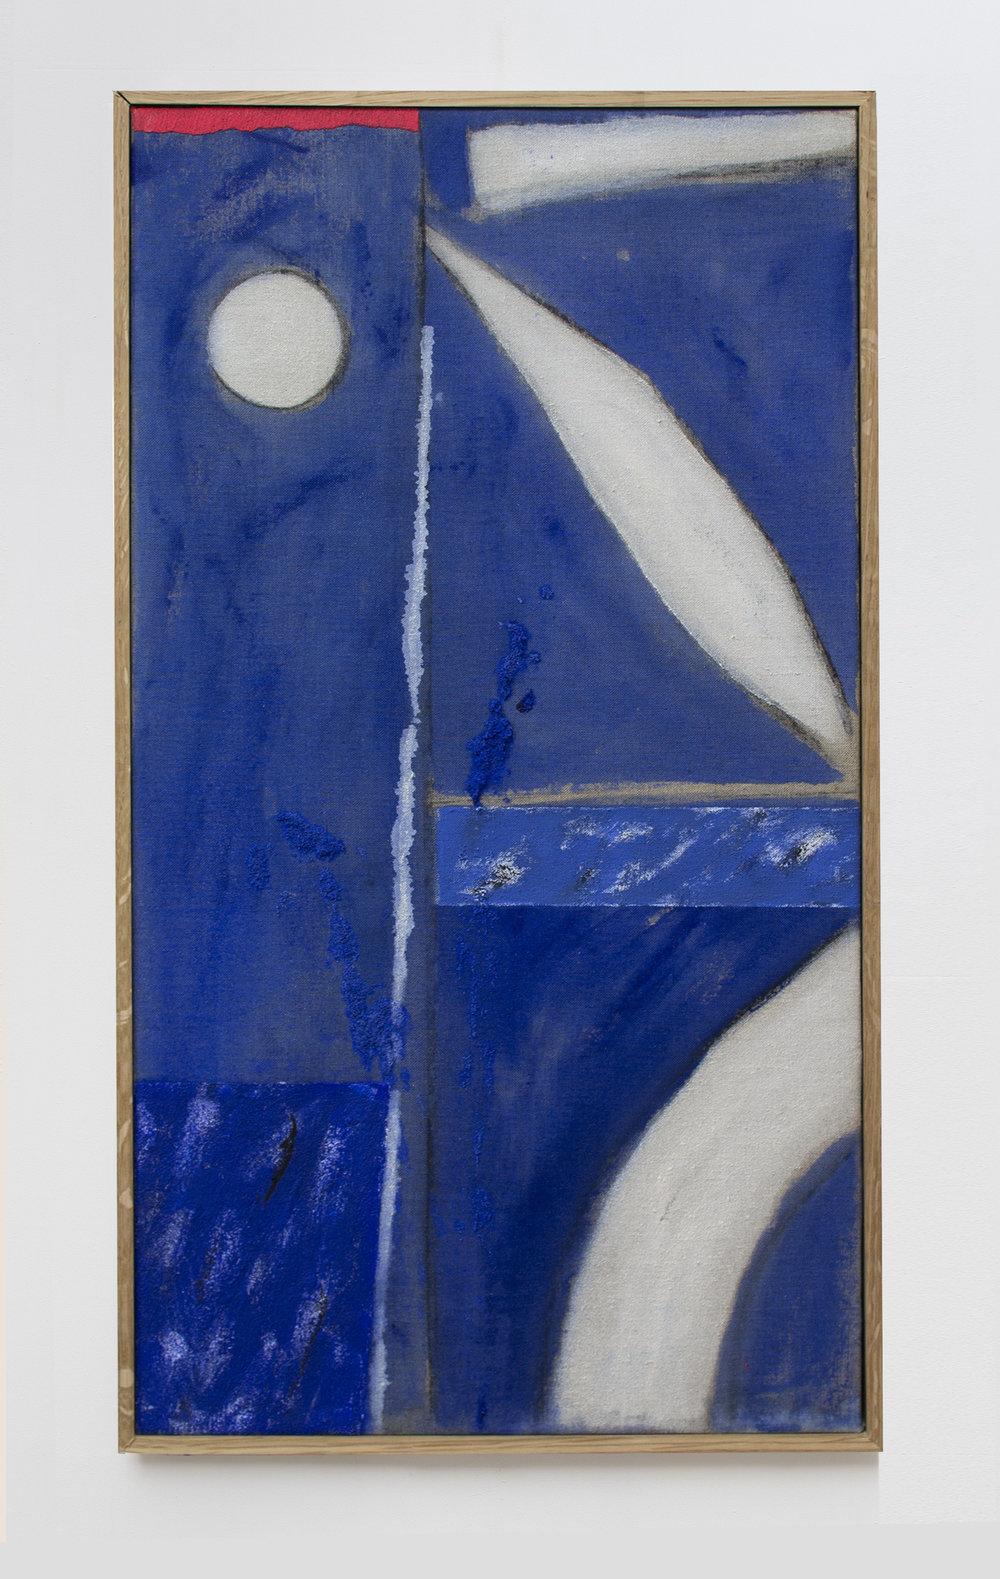 Untitled,65 x 35 cm